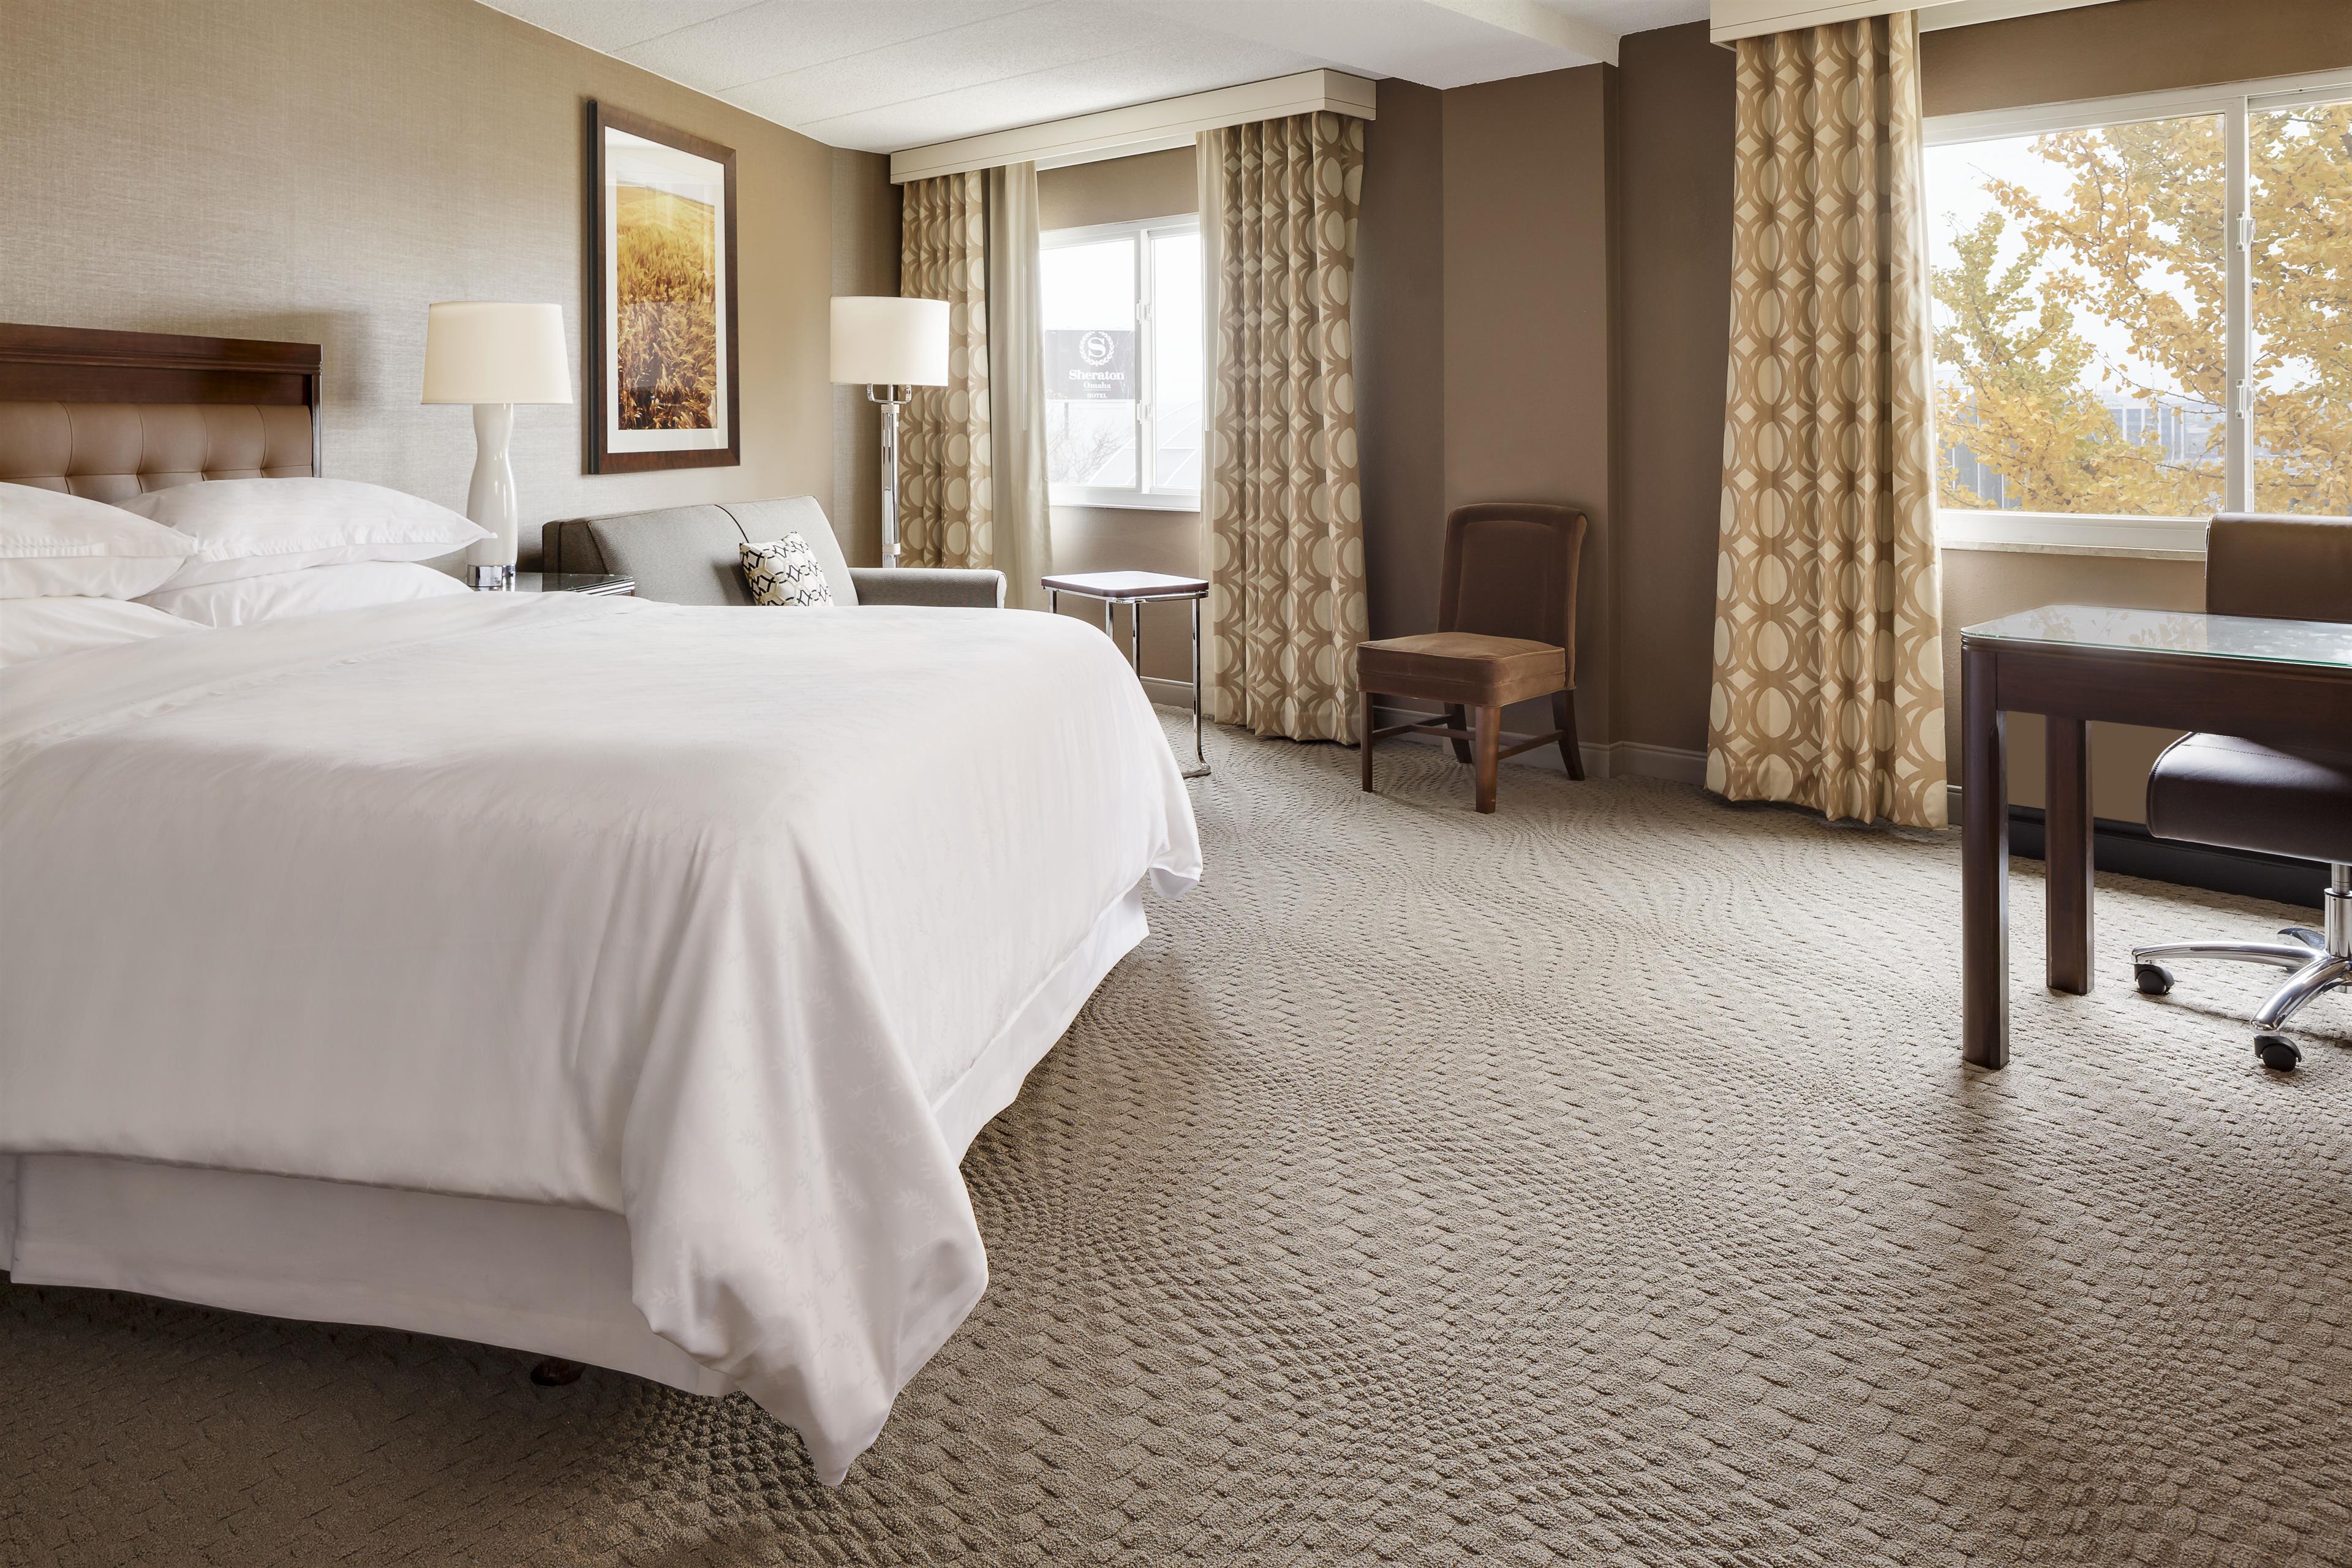 Sheraton Omaha Hotel image 3